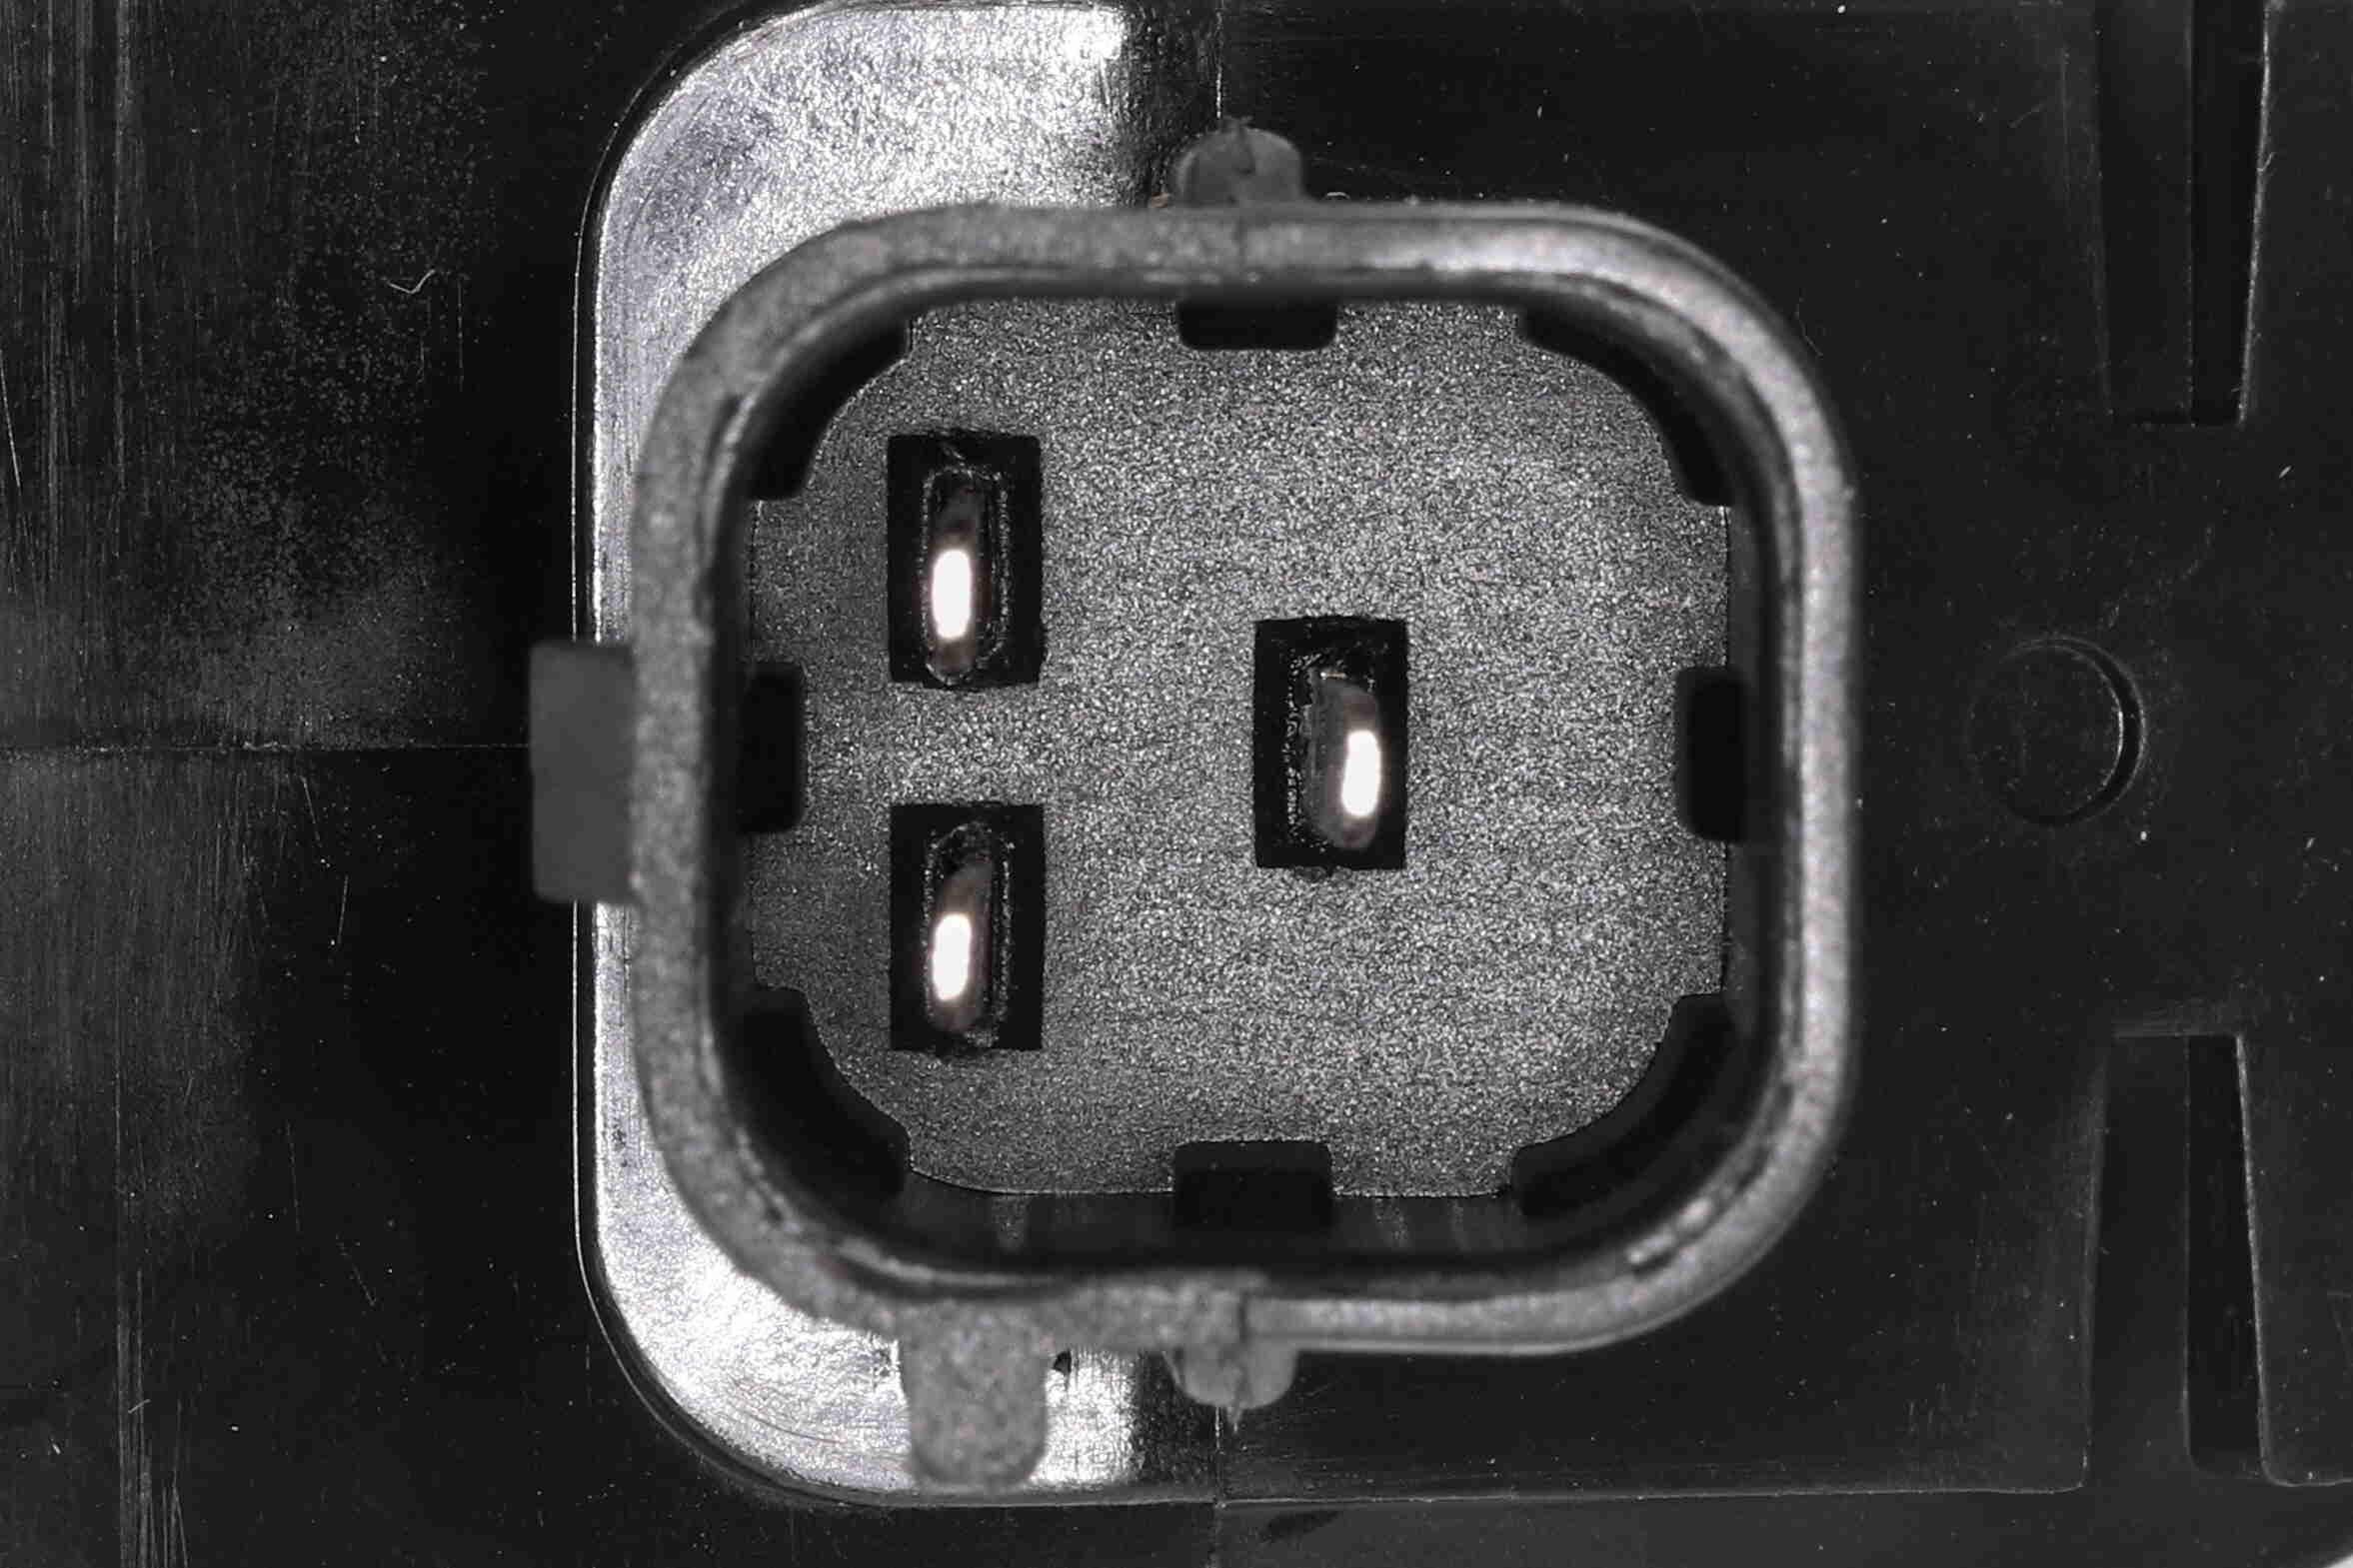 Washer Pump ACKOJA A52-08-0005 rating